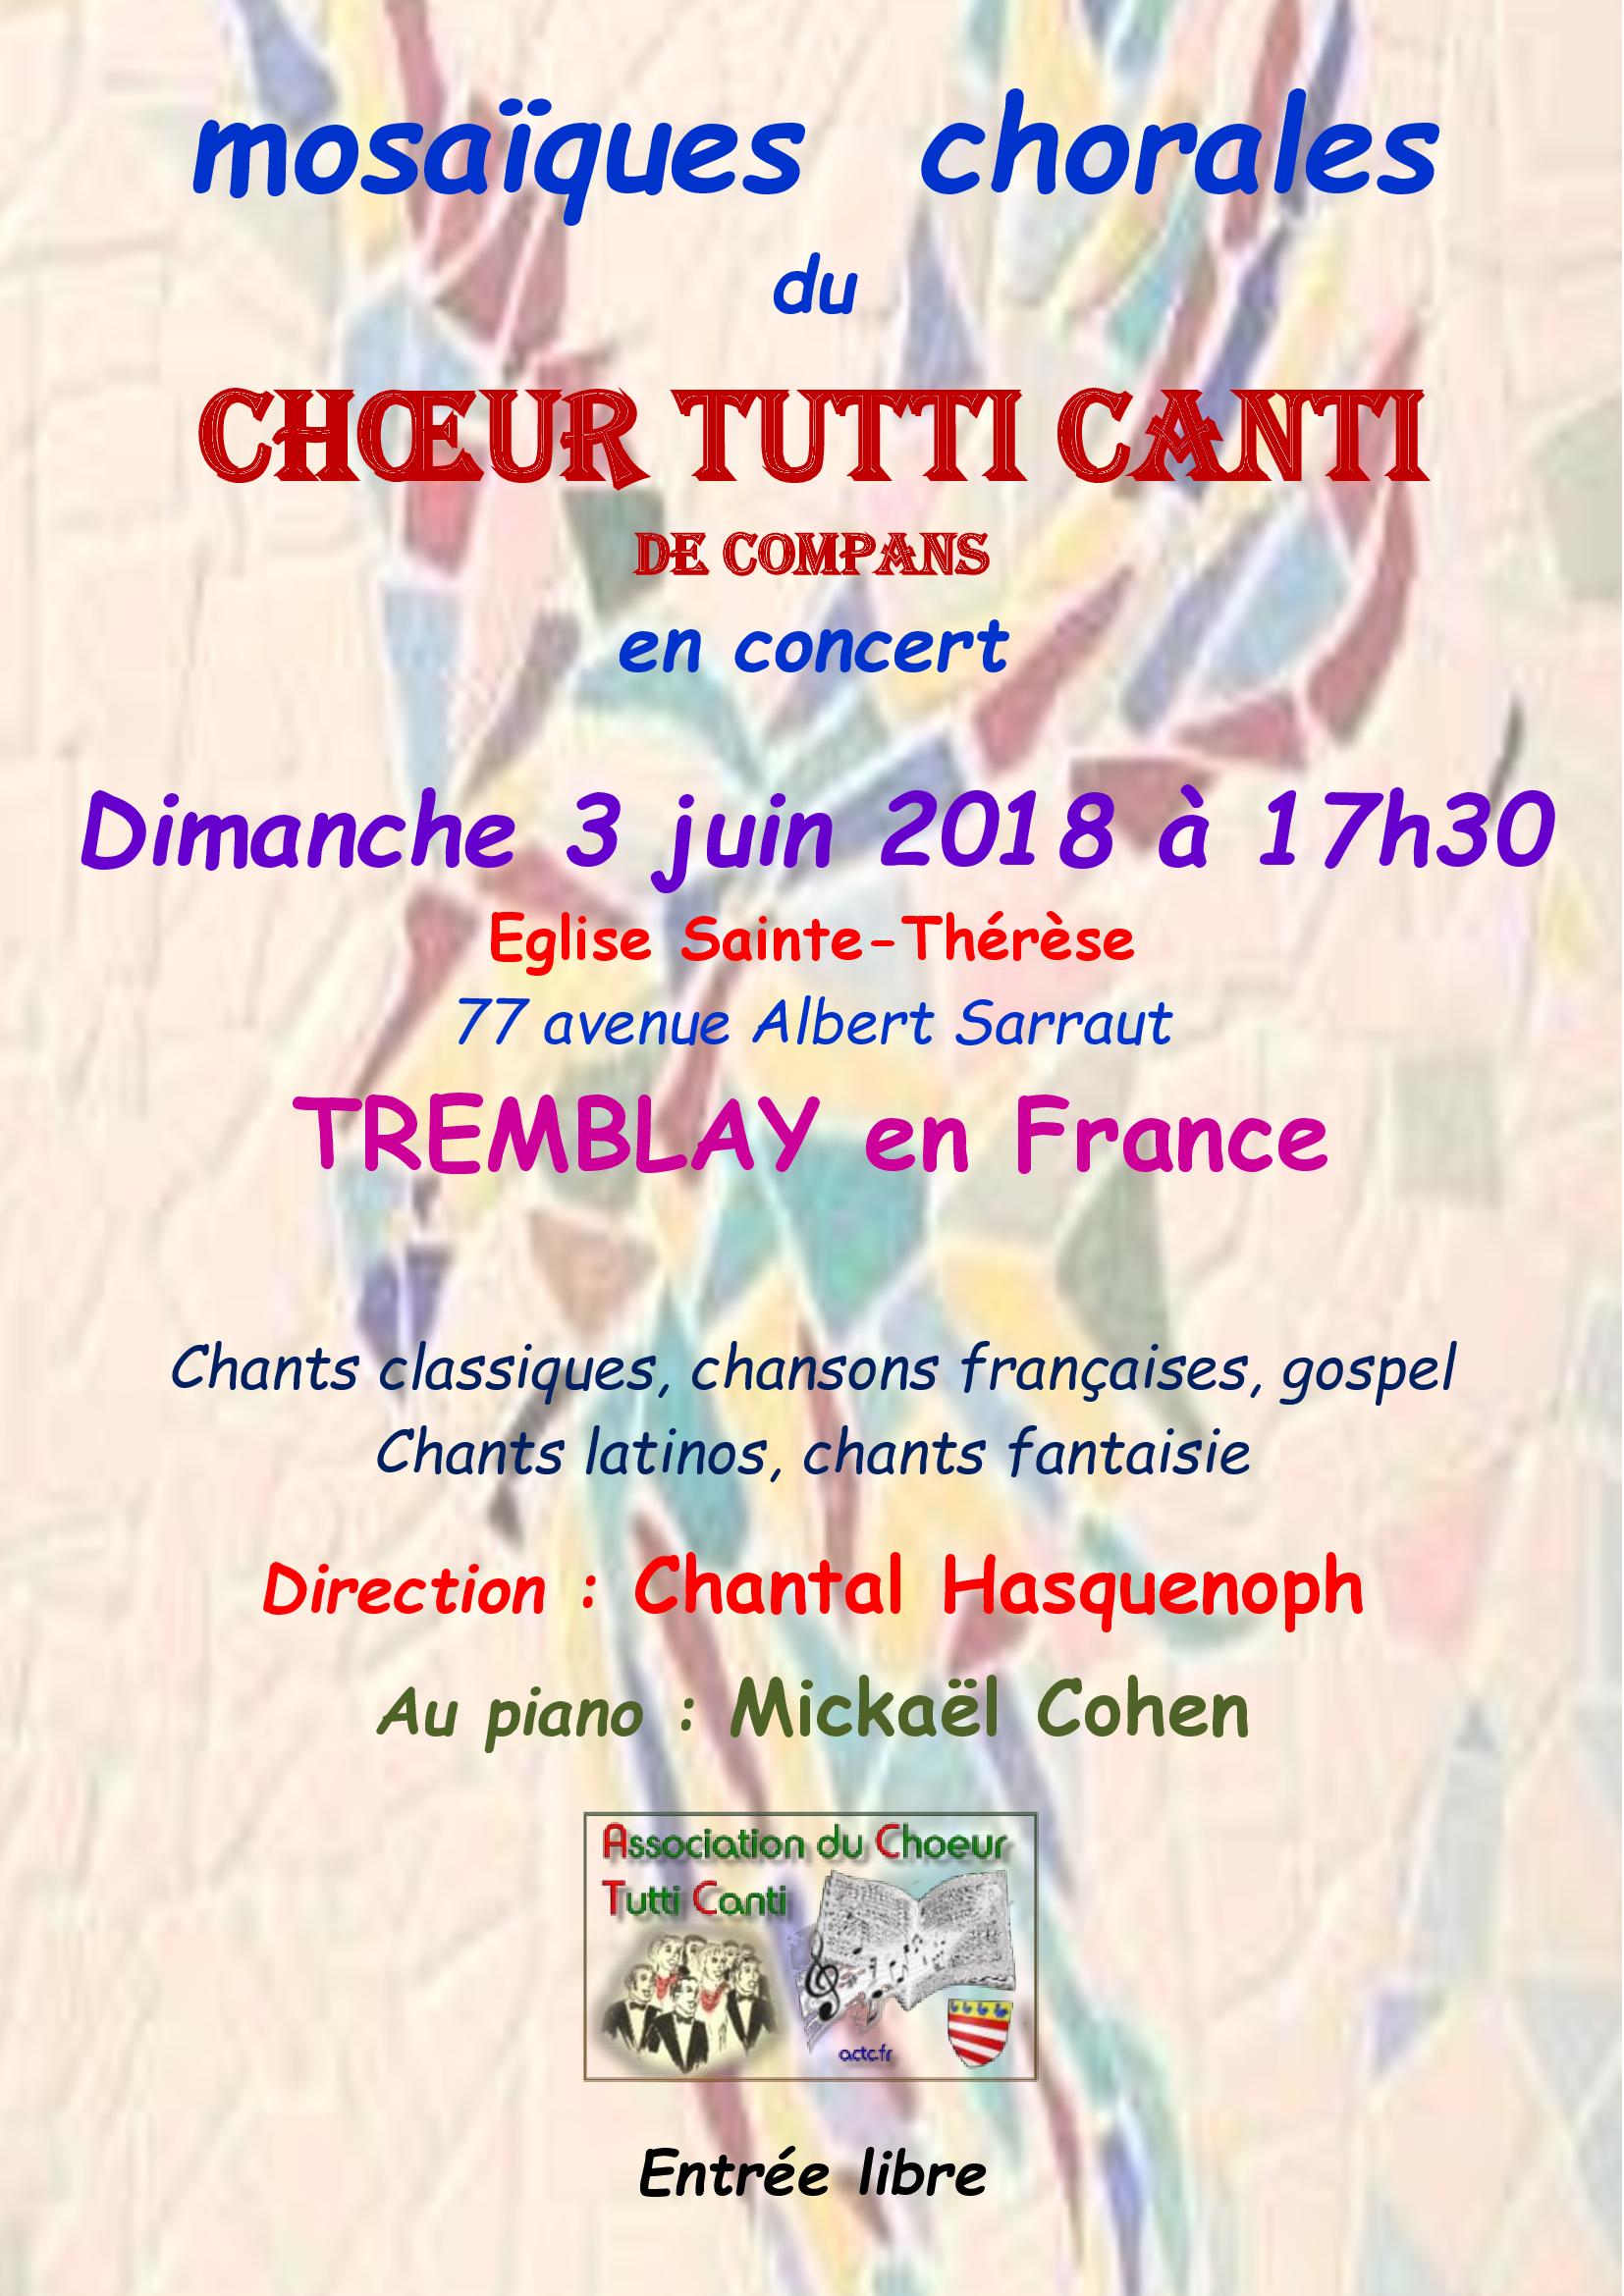 3 juin 2018 - TREMBLAY en FRANCE